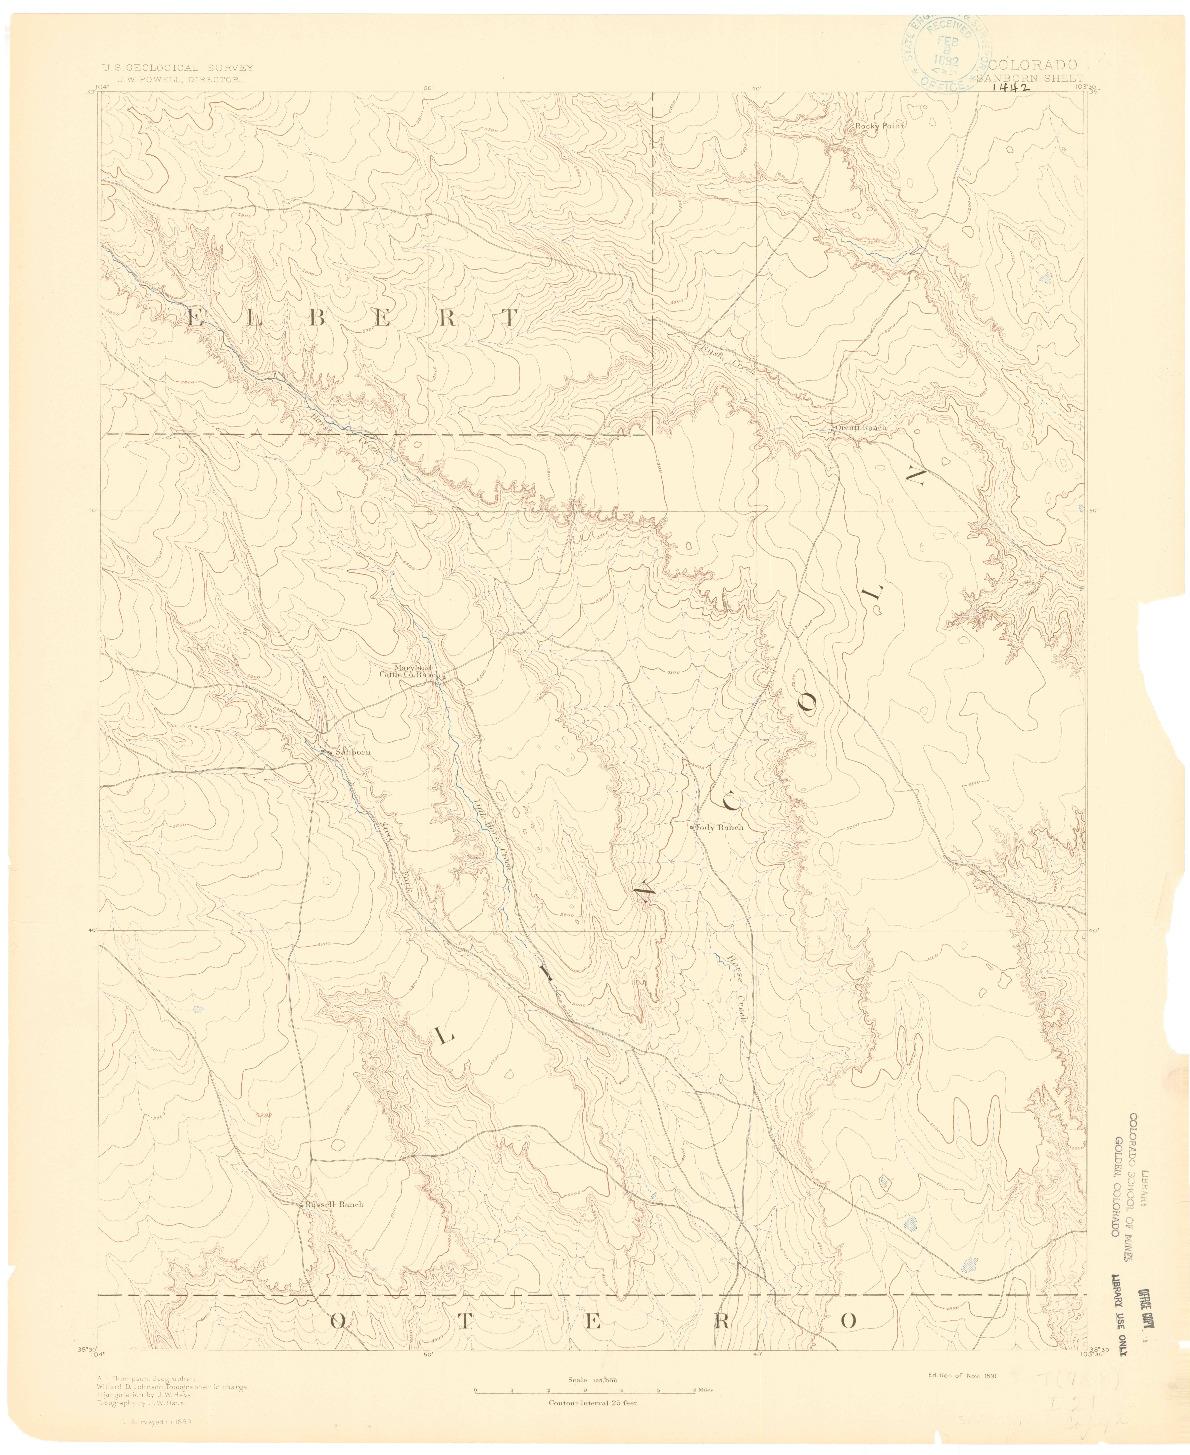 USGS 1:125000-SCALE QUADRANGLE FOR SANBORN, CO 1891